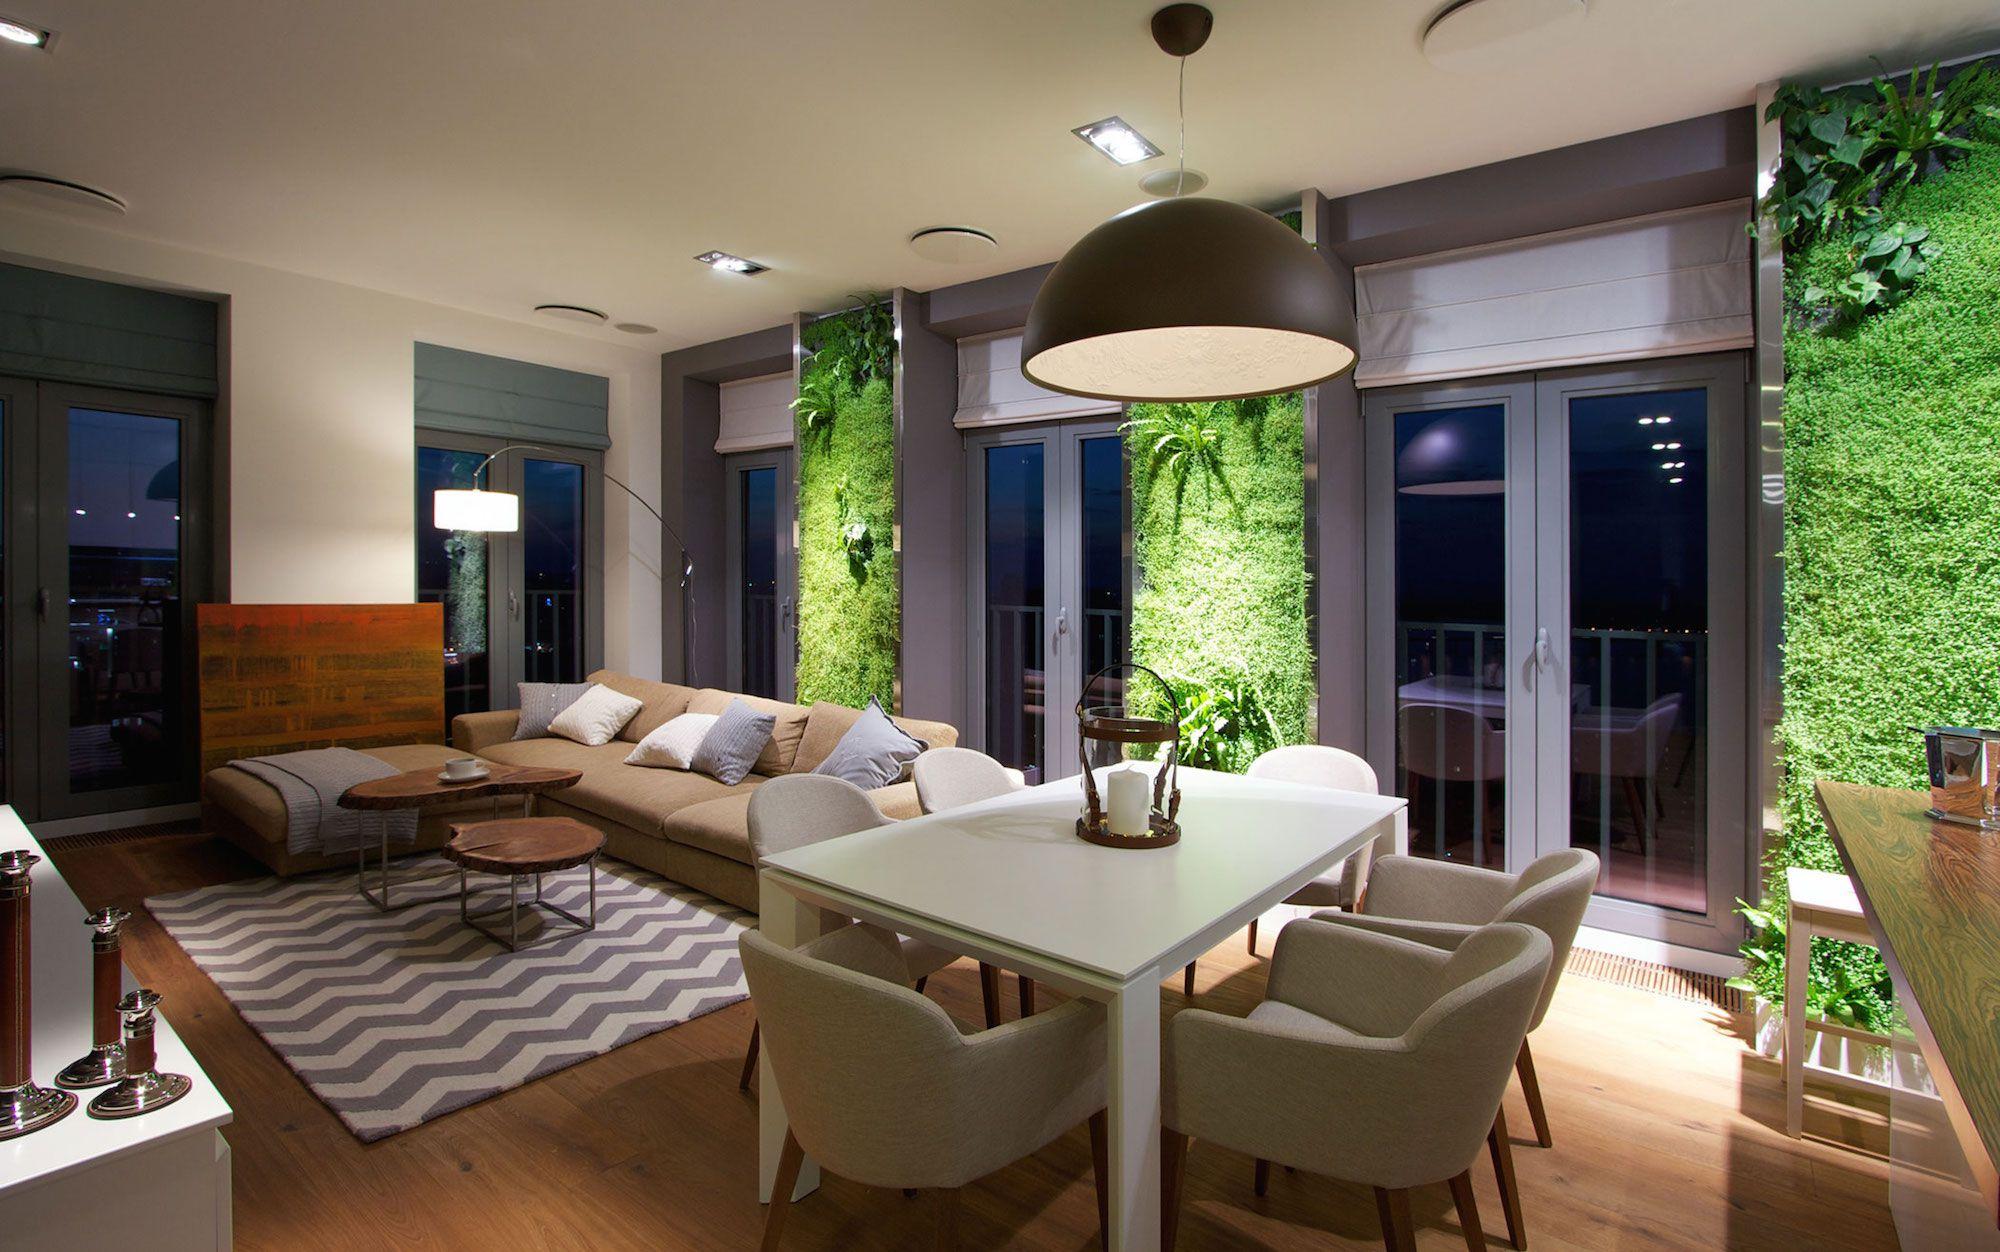 Green Grass Walls Apartment by SVOYA Studio-19